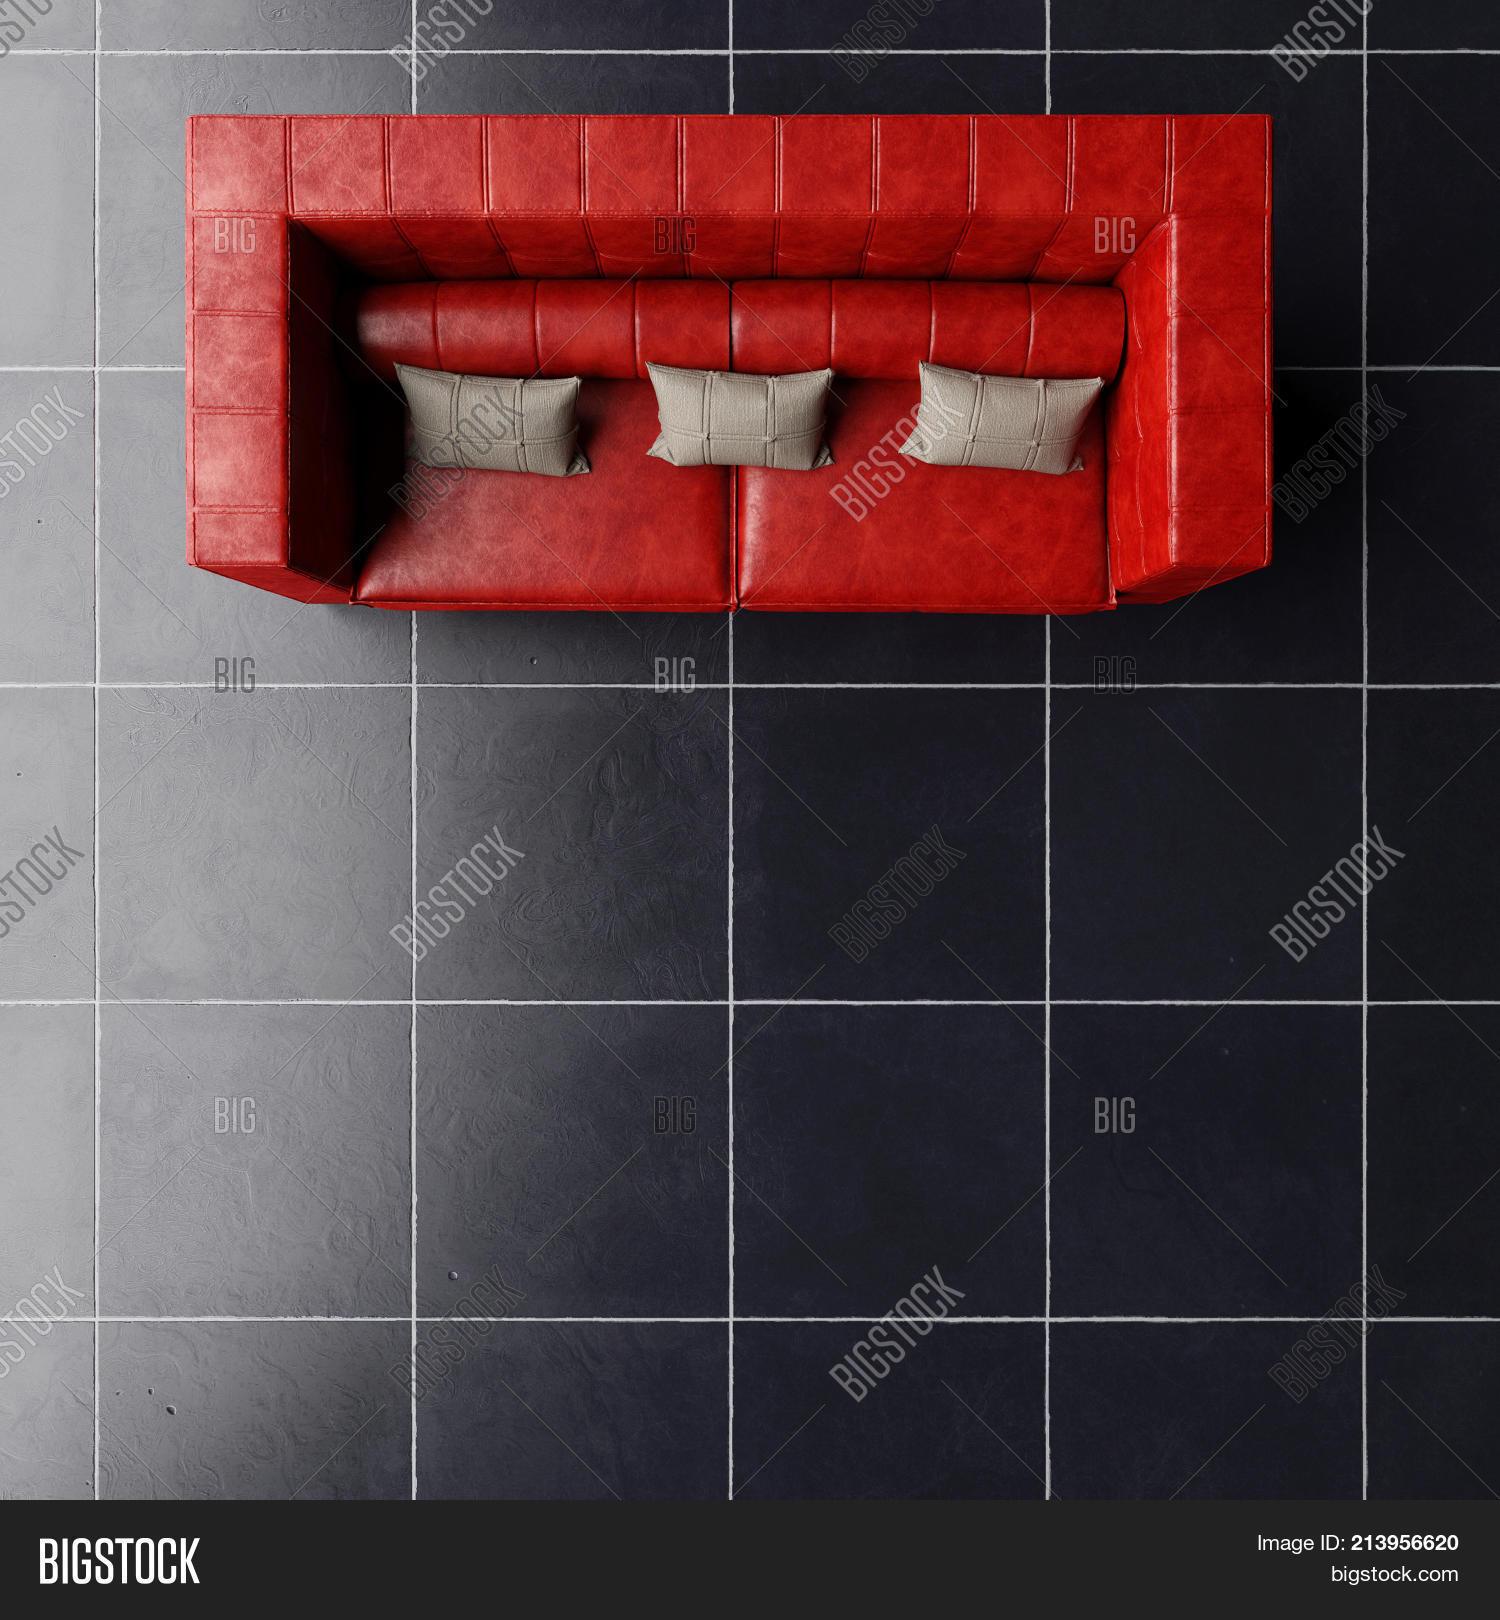 Terrific Top View Red Sofa On Image Photo Free Trial Bigstock Machost Co Dining Chair Design Ideas Machostcouk